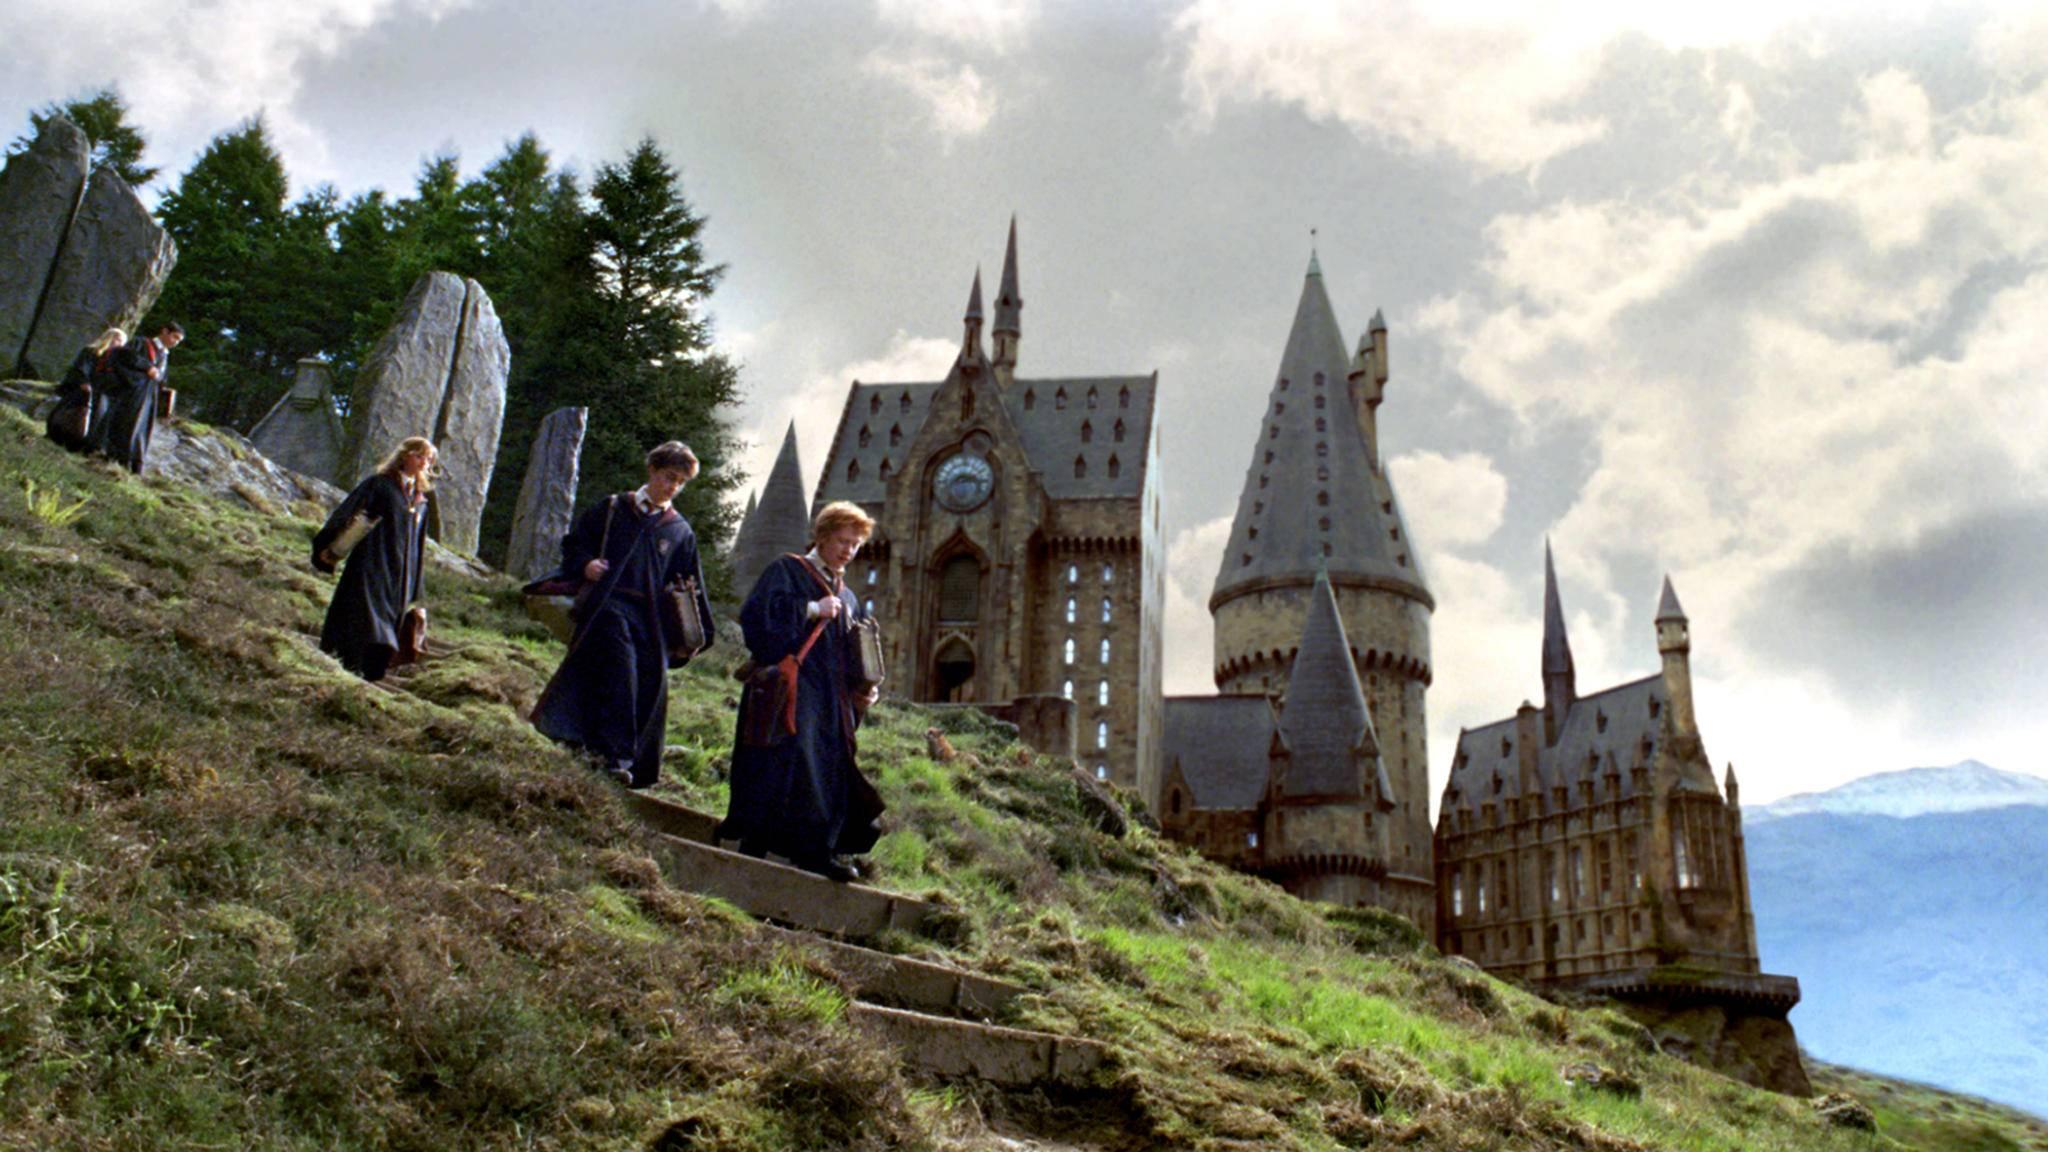 Harry Potter Hauser Im Uberblick Welche Eigenschaft Gehort Zu